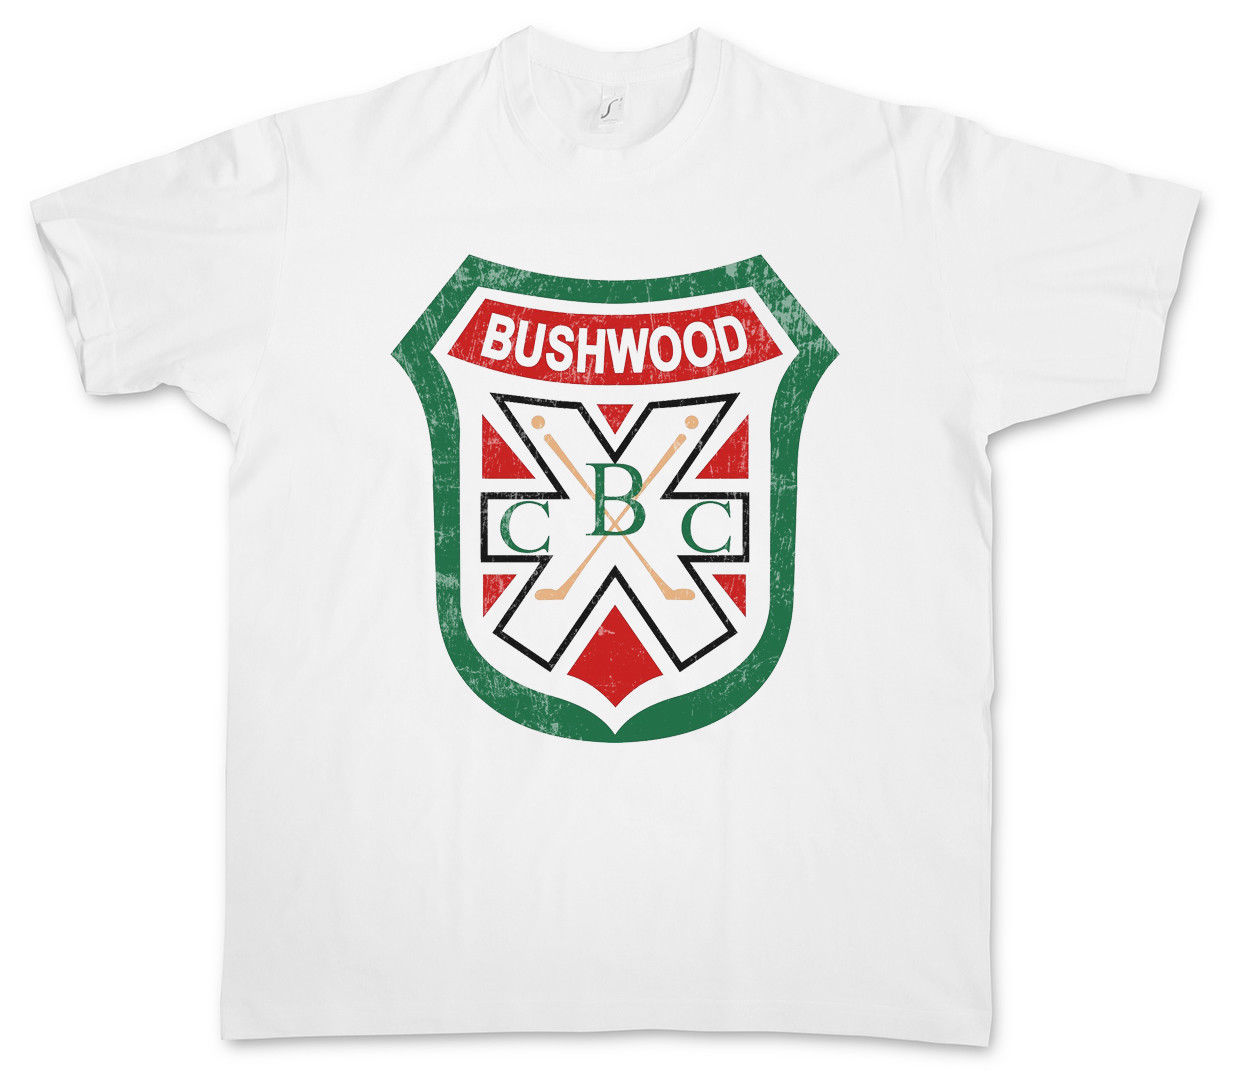 BUSHWOOD COUNTRY CLUB II T-SHIRT Caddyshack Sign Insignia Logo Company Golfed Design T Shirts Casual Cool